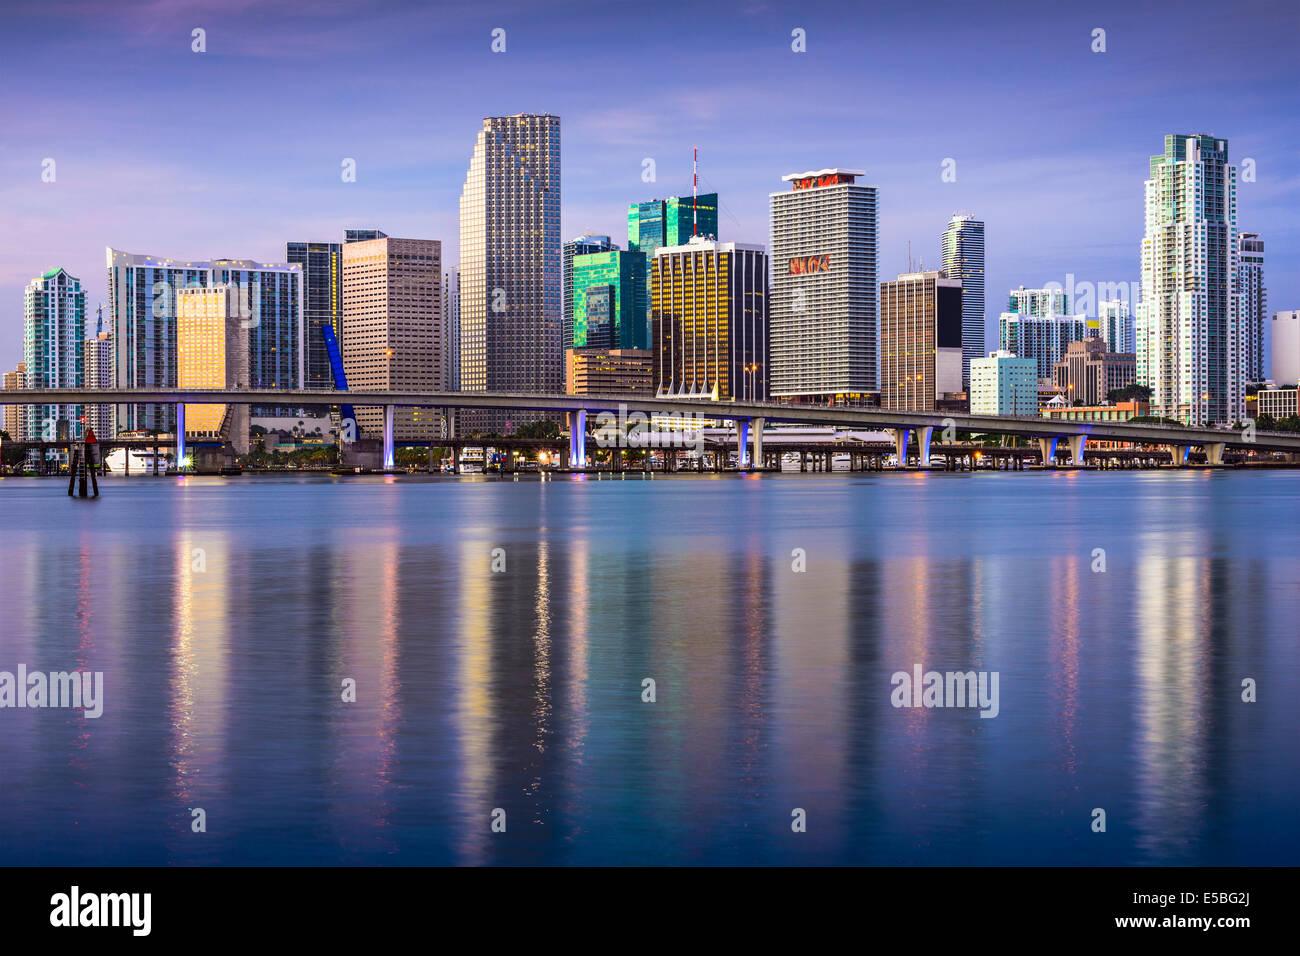 Miami, Florida, USA downtown skyline. - Stock Image